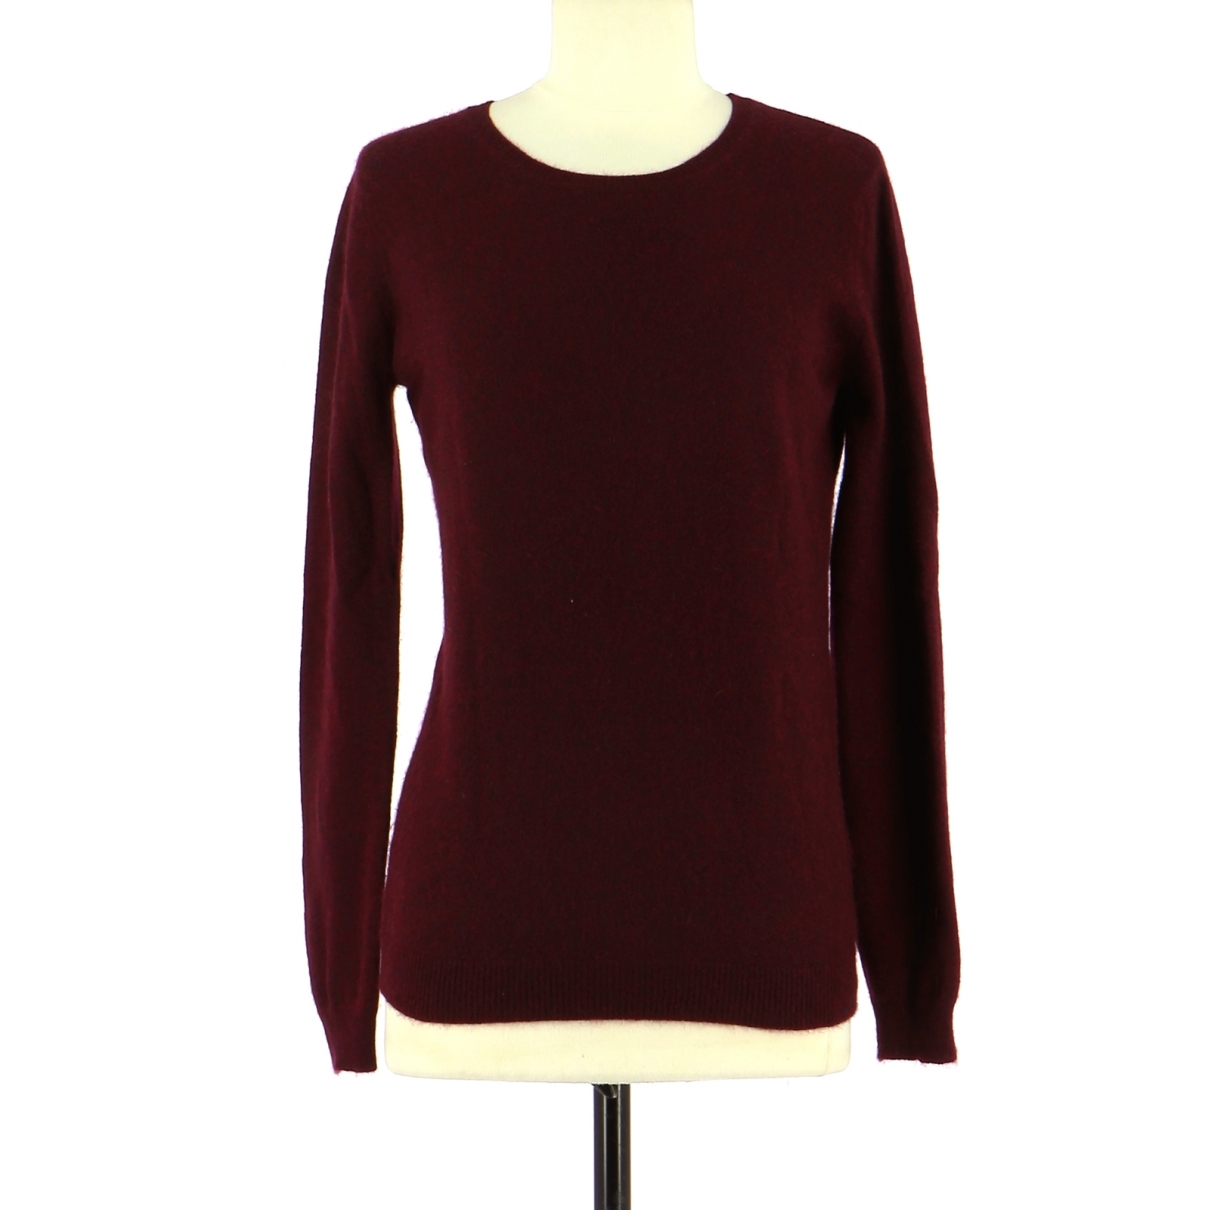 Kujten \N Burgundy Cashmere Knitwear for Women 38 FR